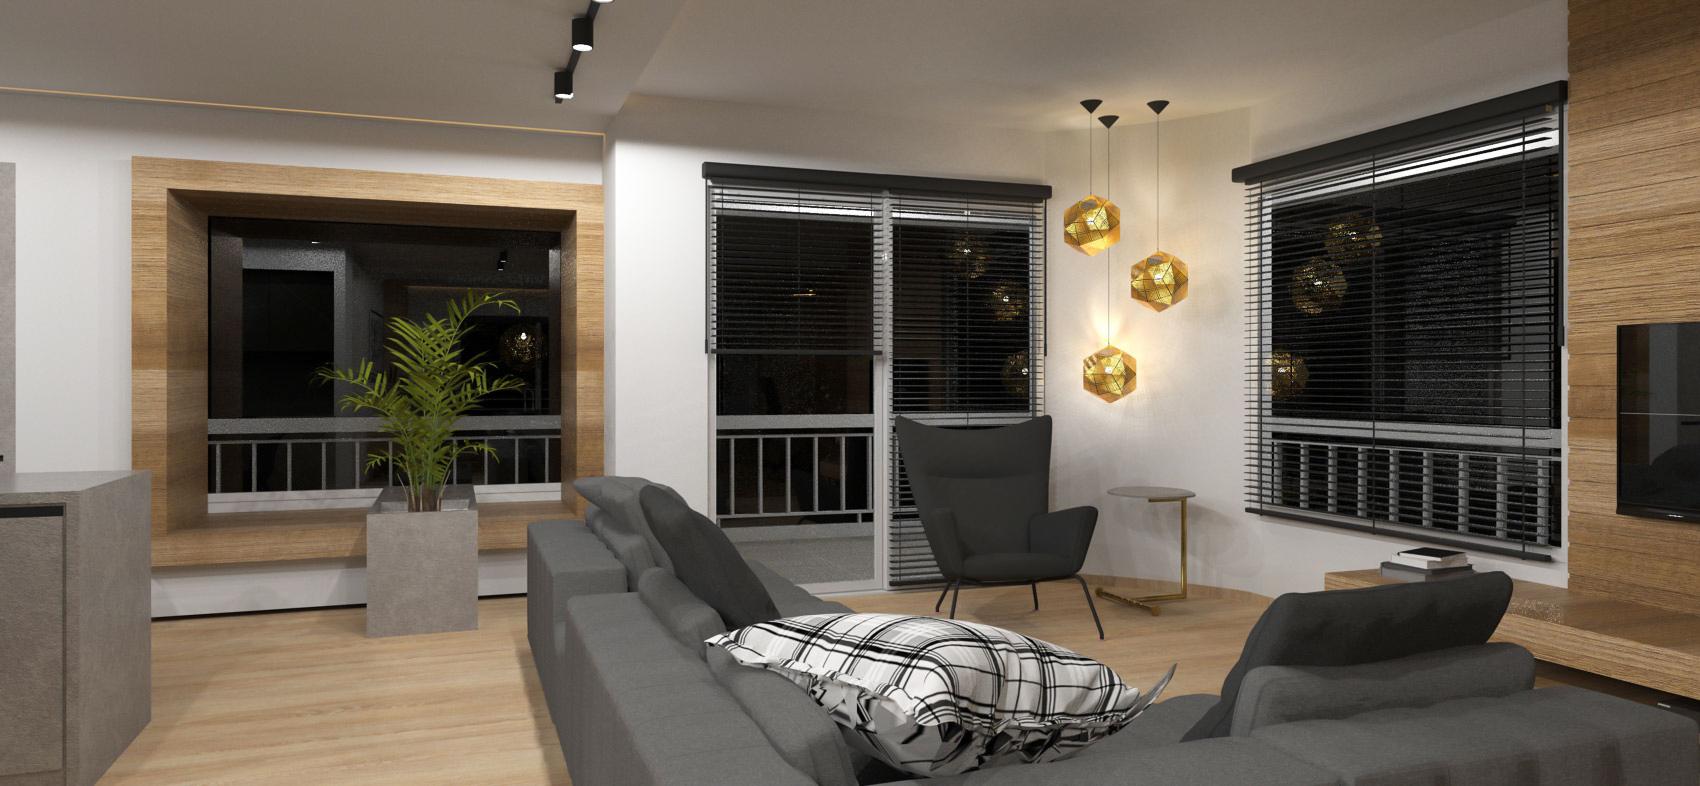 archicostudio_house-yk16_living4a